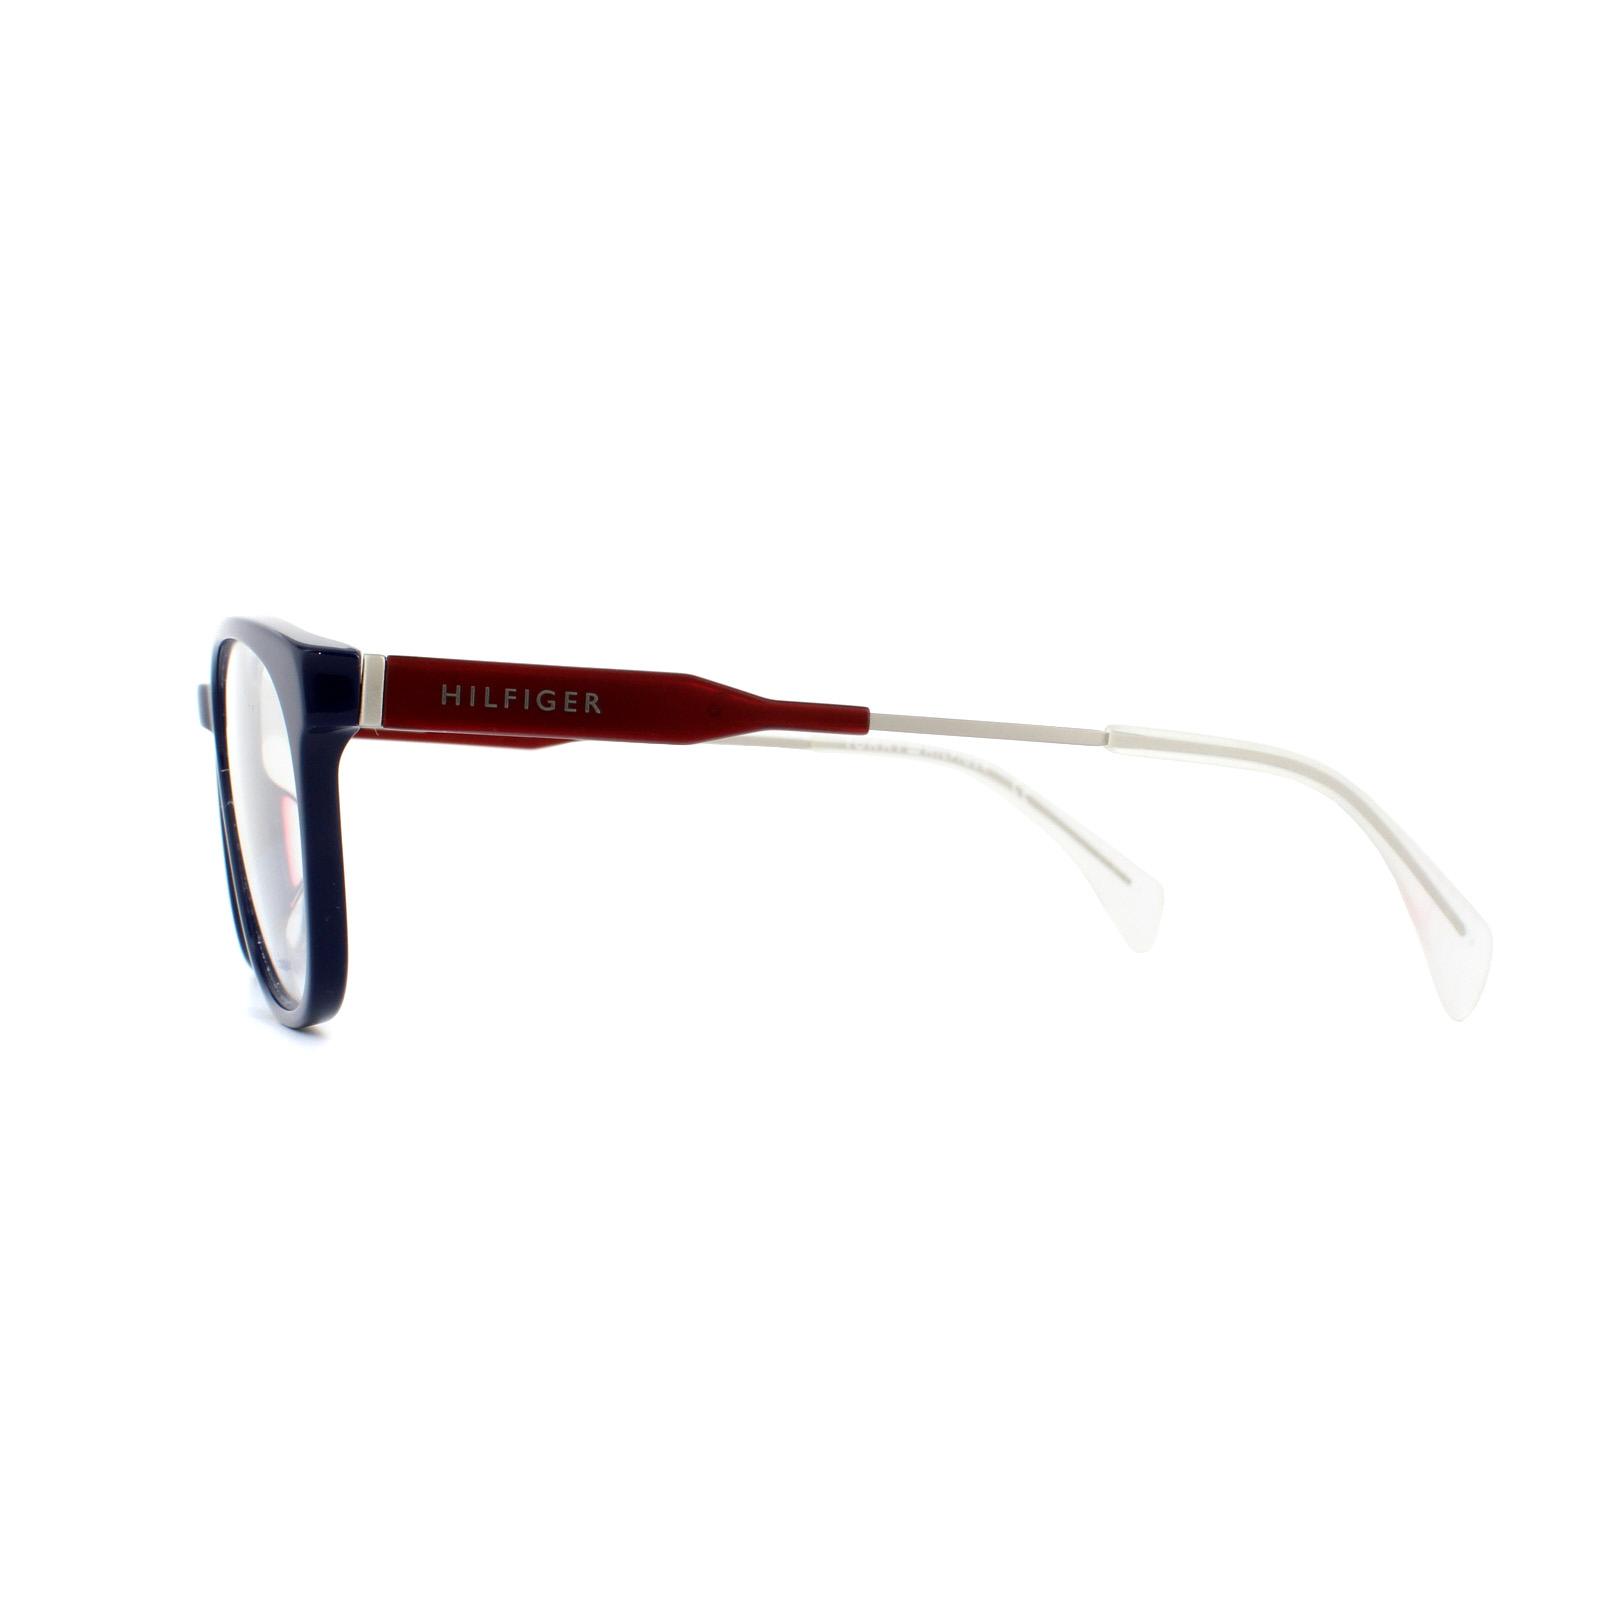 0901f91074f Tommy Hilfiger Glasses Frames TH 1373 JX3 Blue Red 53mm 762753895790 ...